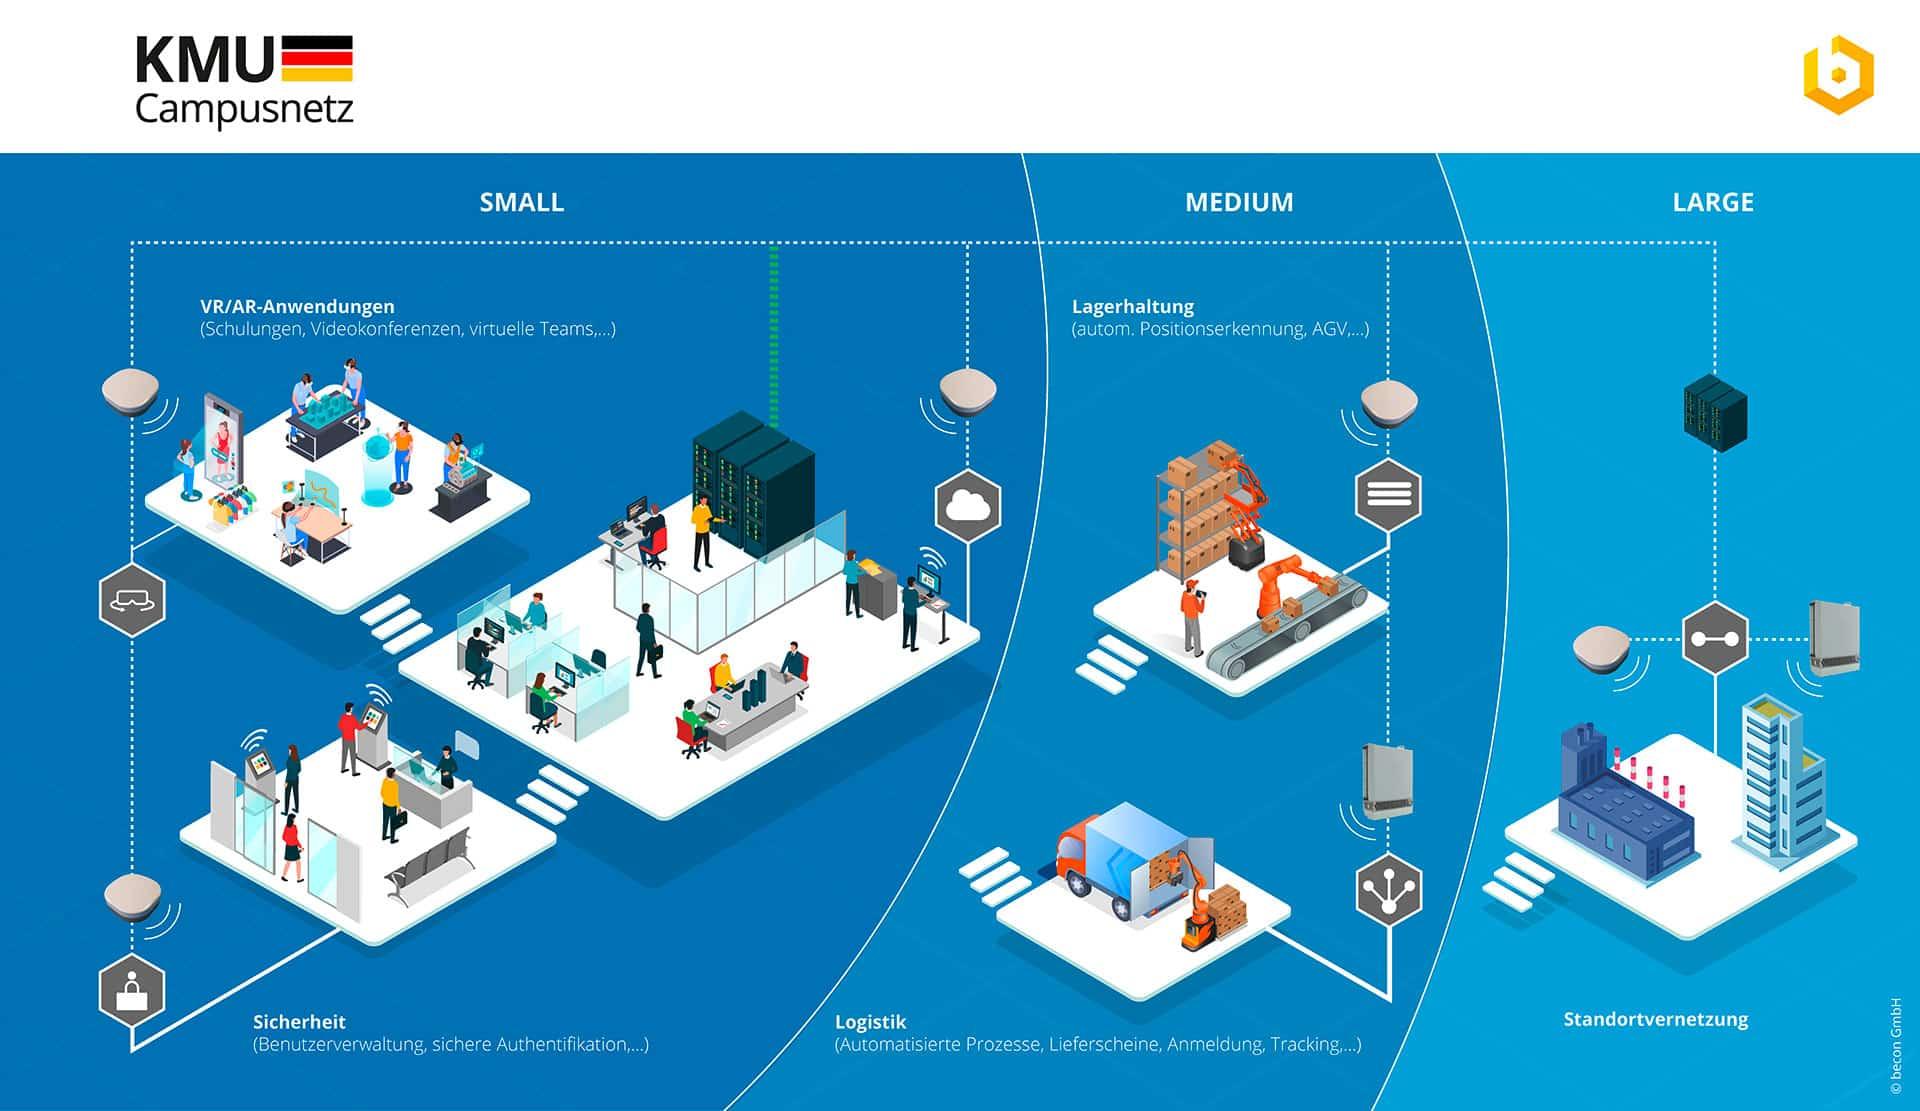 kmu campusnetz 5g infografik becon gmbh